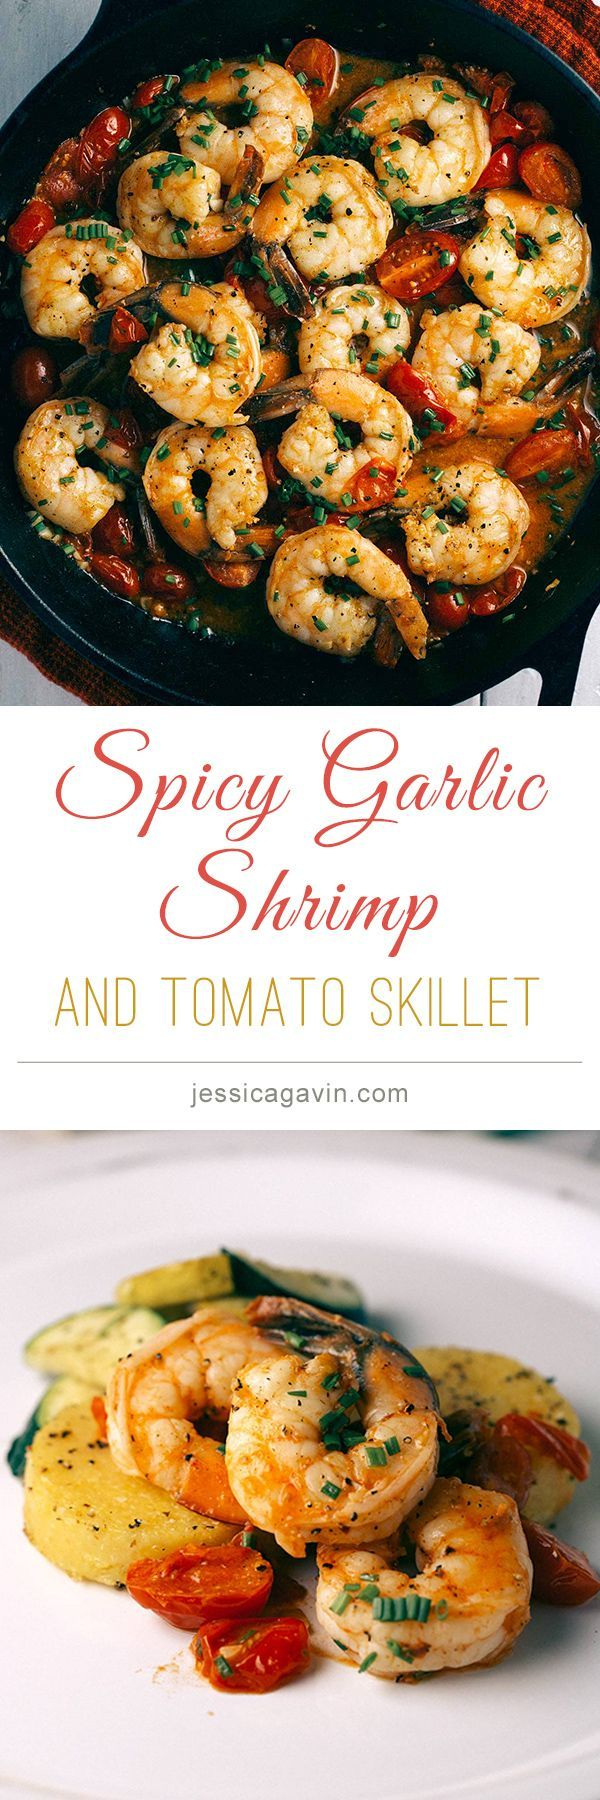 Spicy Garlic Jumbo Shrimp and Tomato Skillet   jessicagavin.com #seafoodrecipes #appetizer